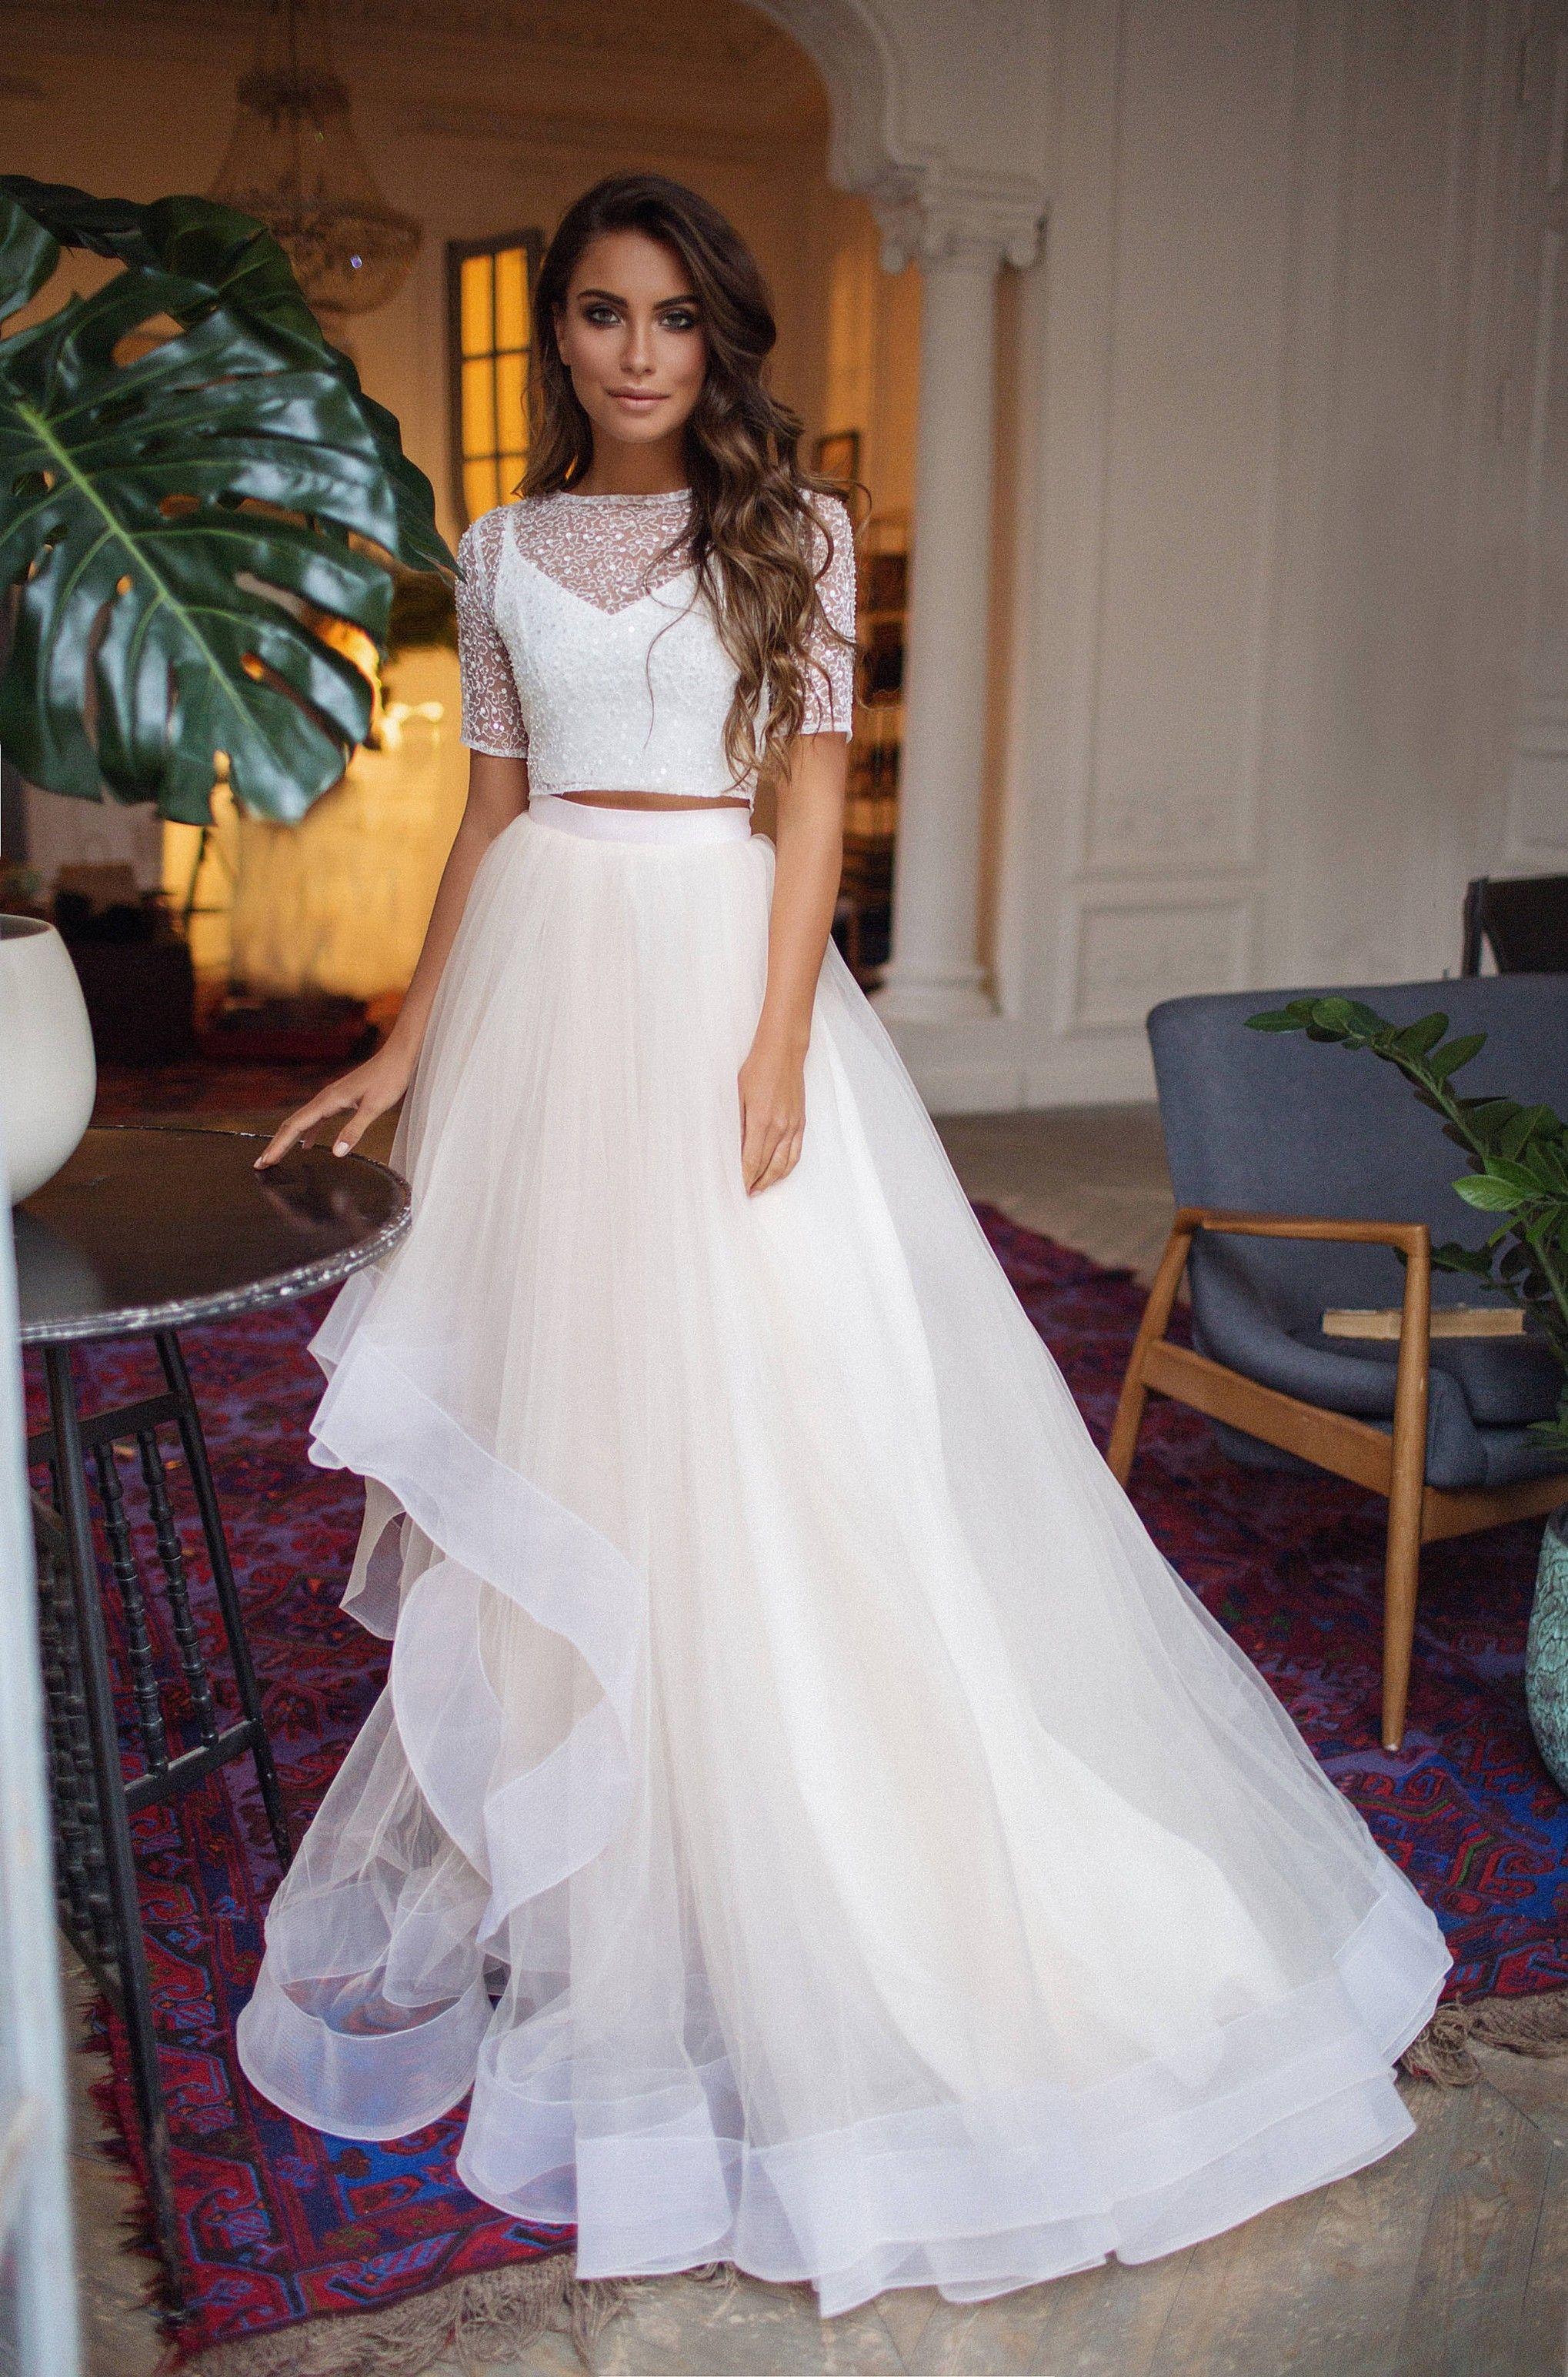 90+ Classy Looks Crop Top Bridal Wedding Dresses in 2020